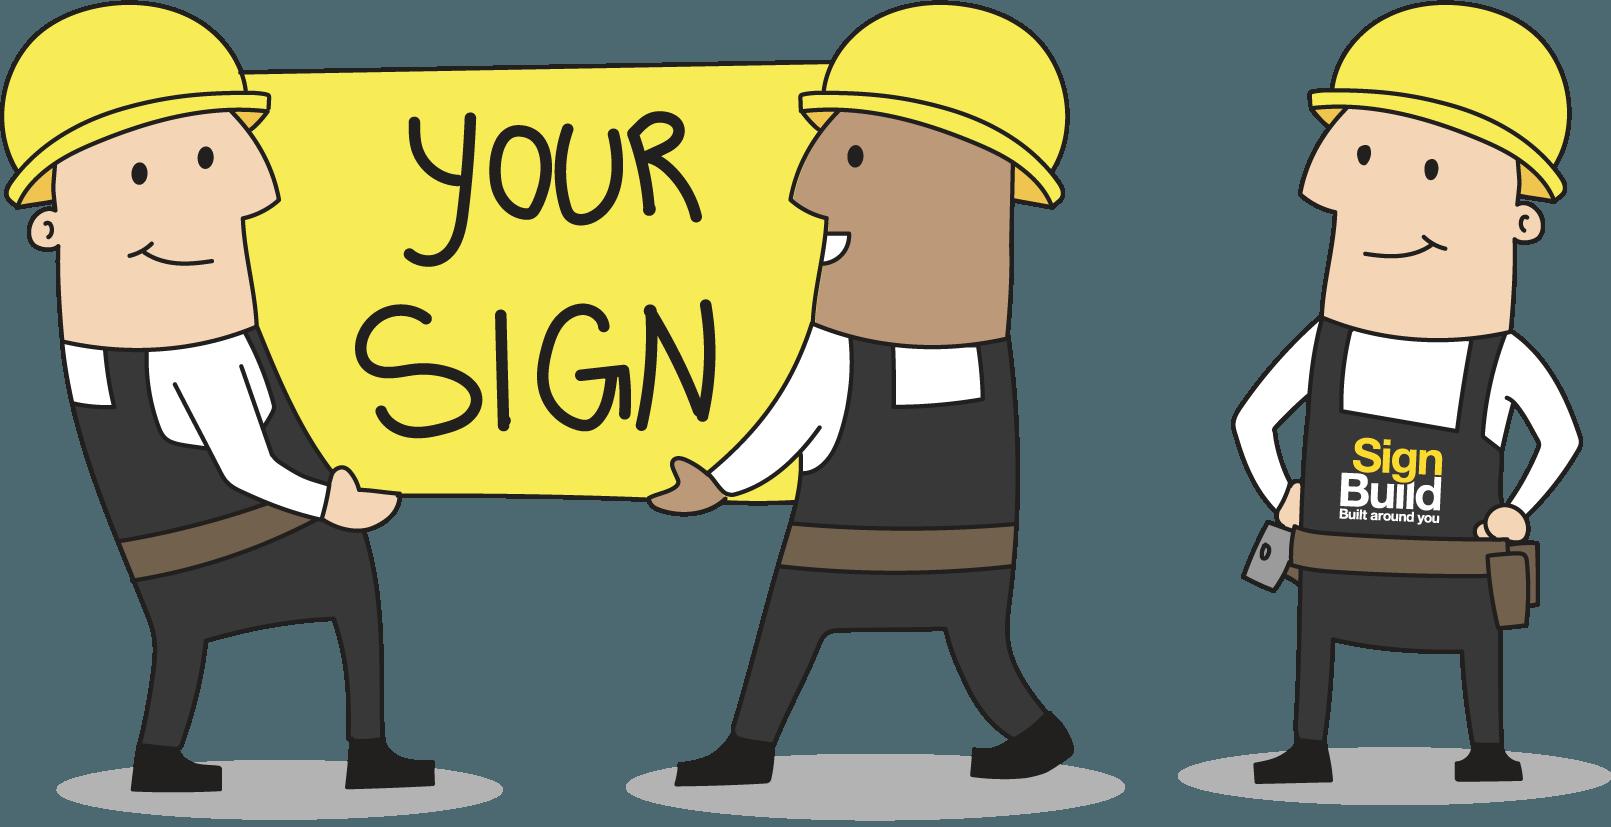 Sign installation build housing. Environment clipart built